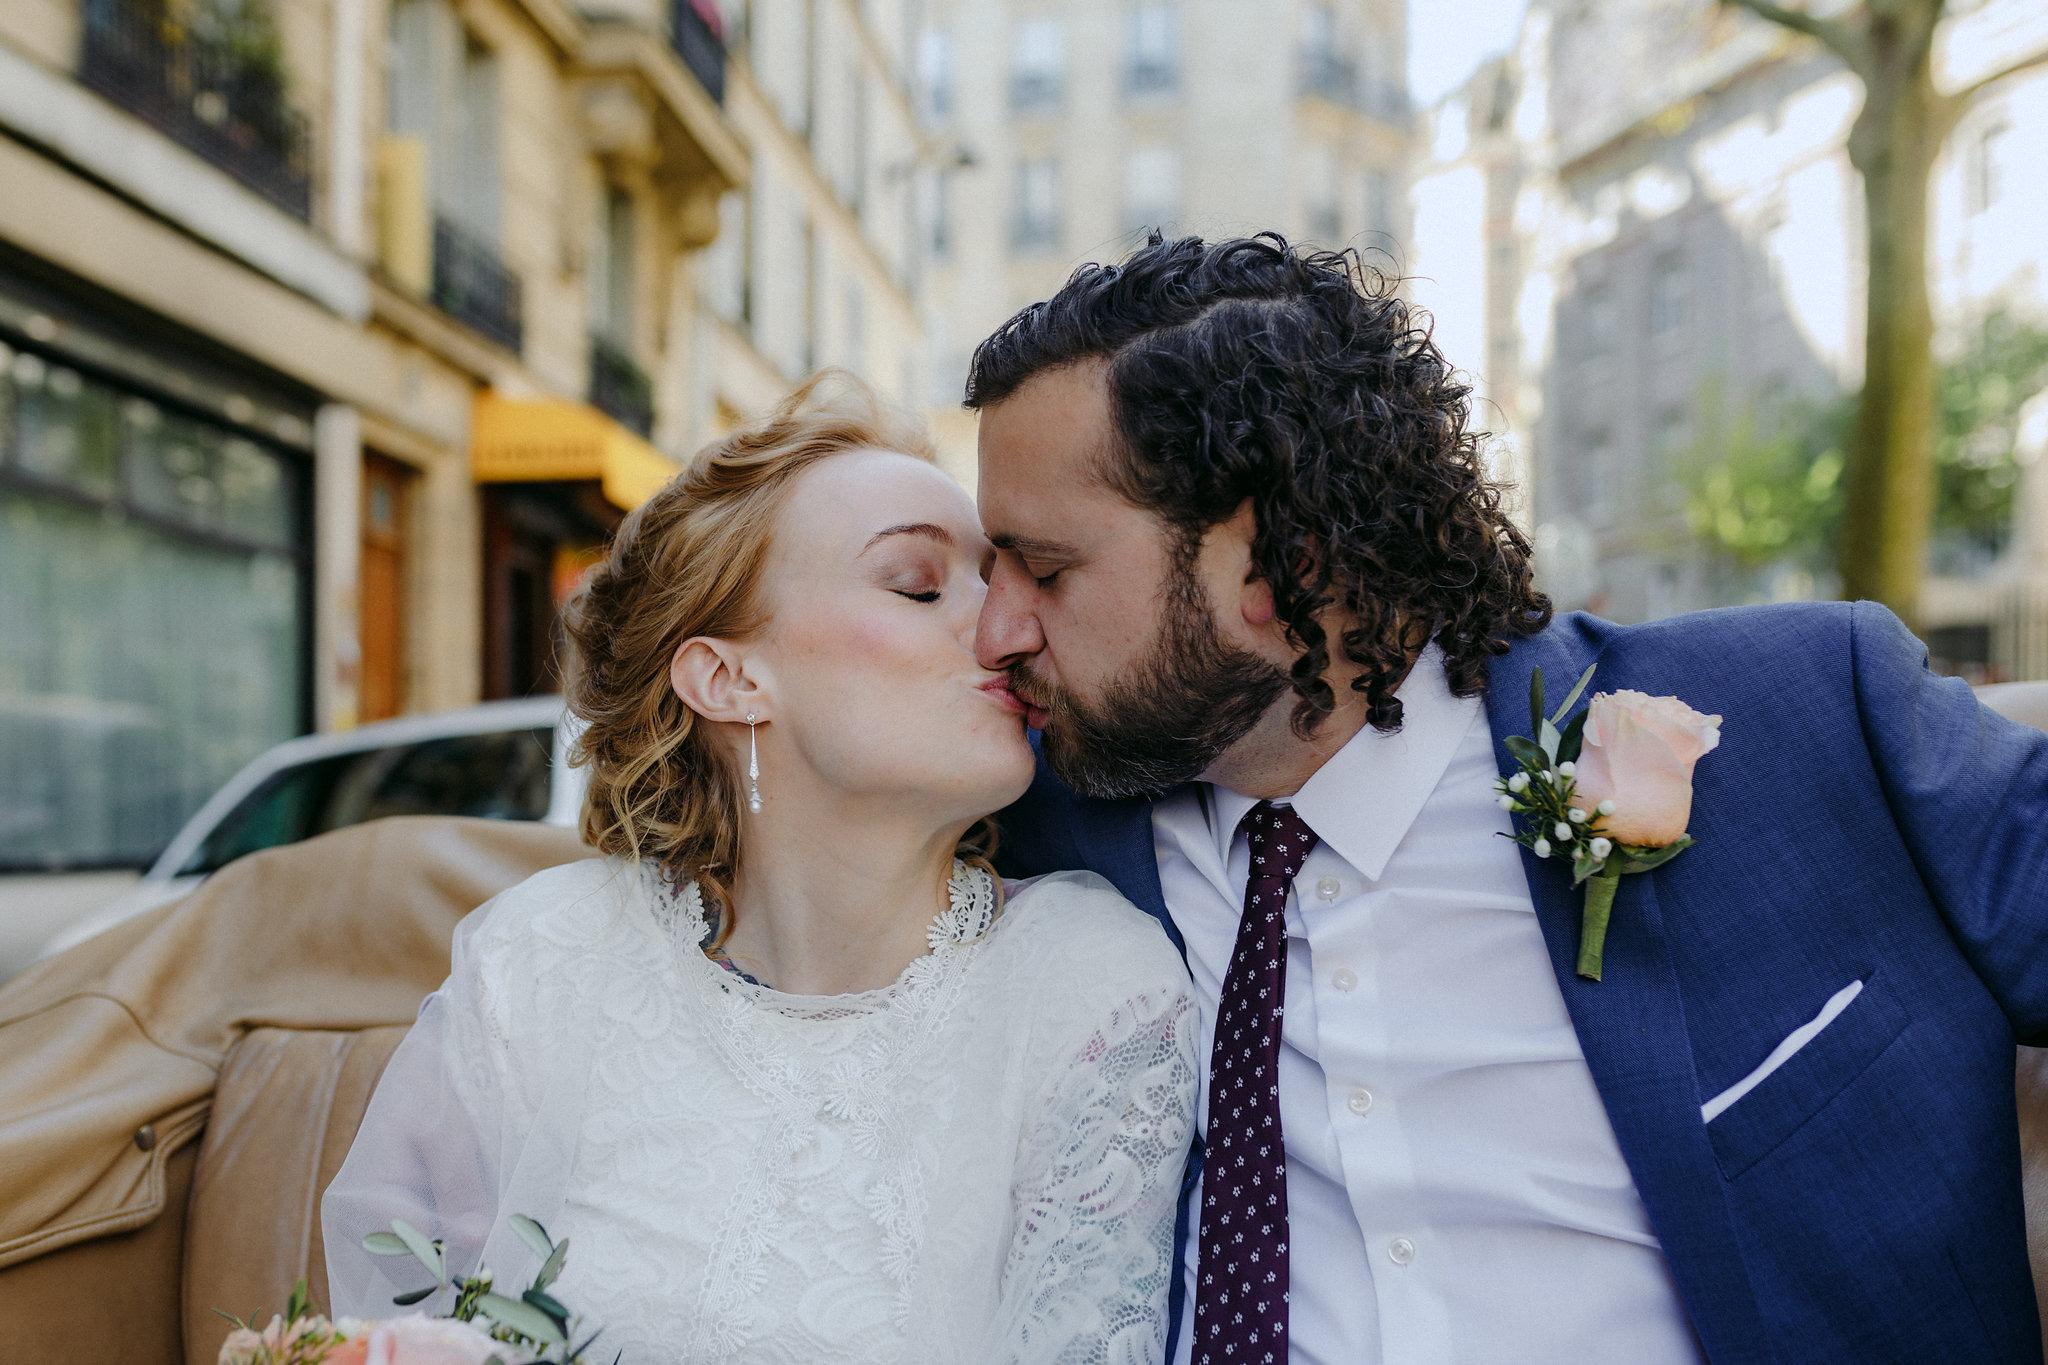 Paris_elopement_wedding_photographer-242.jpg